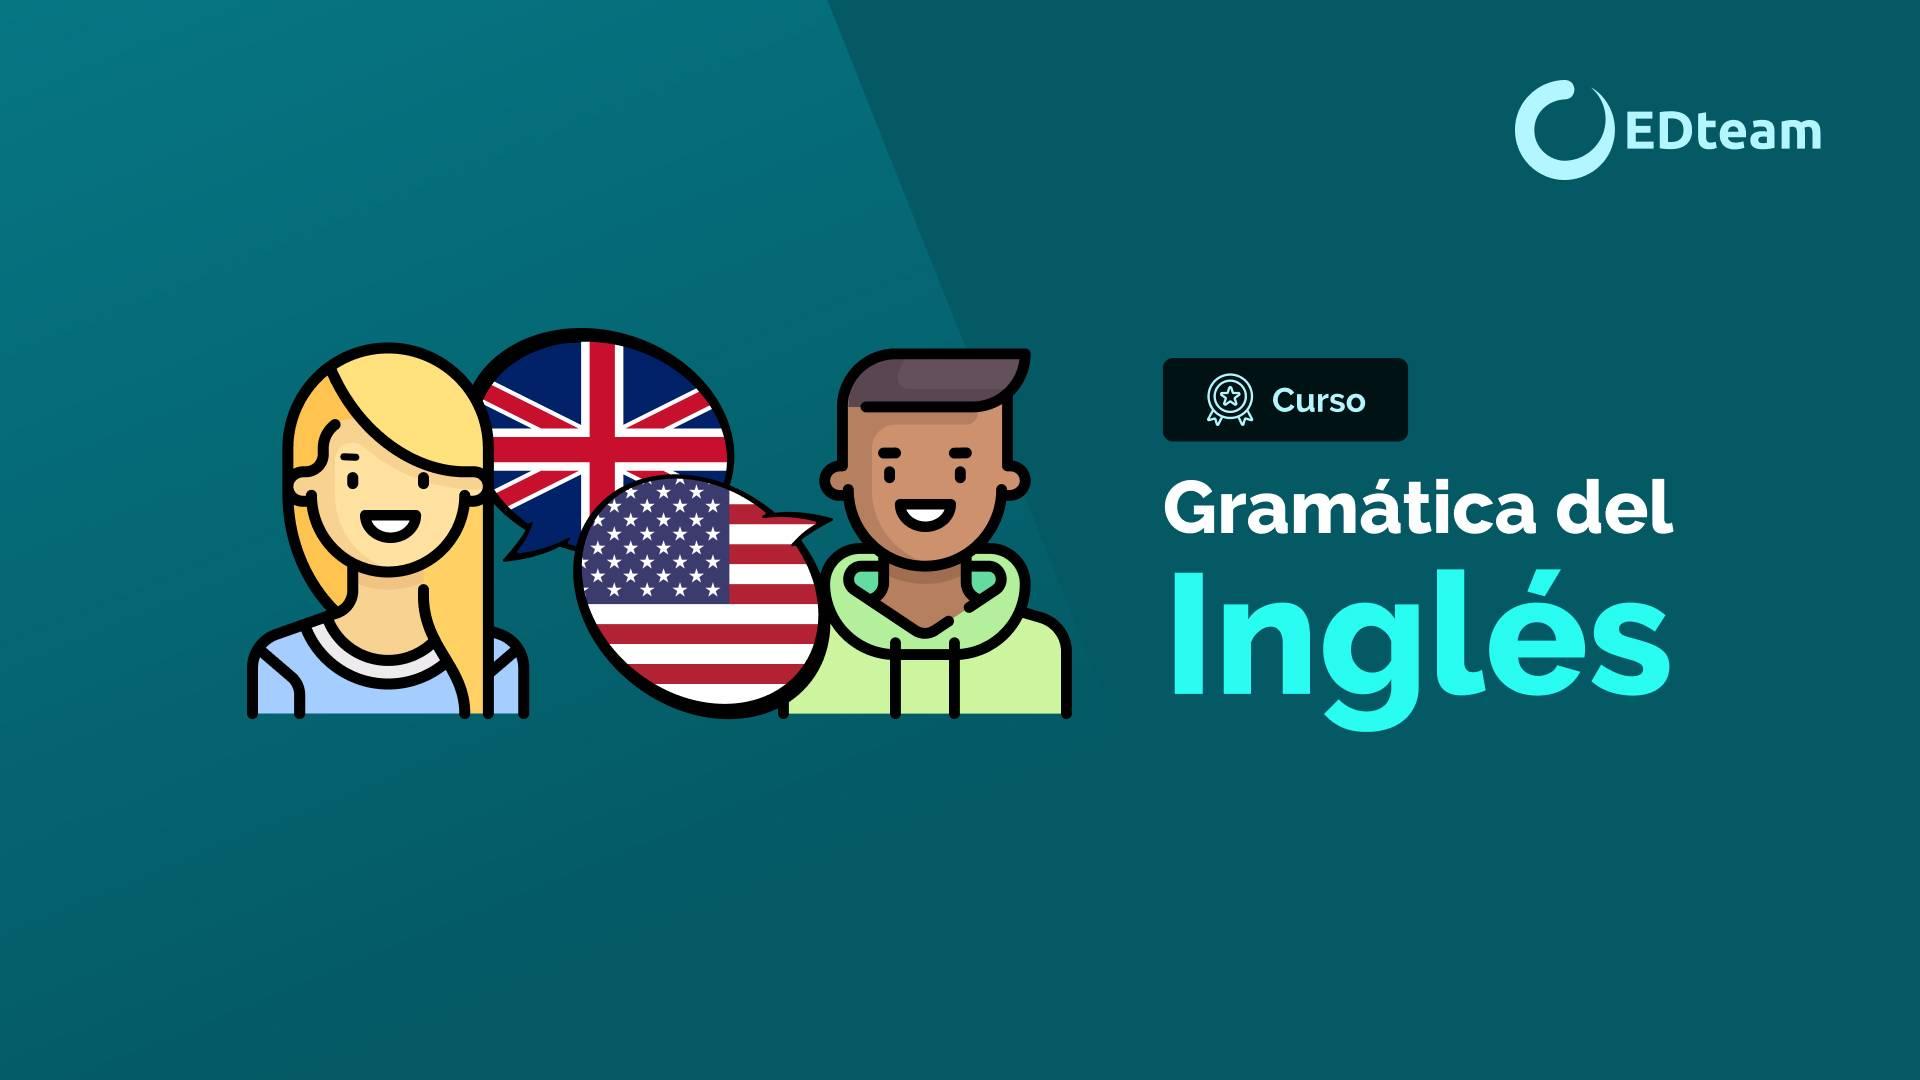 Curso de gramática del inglés